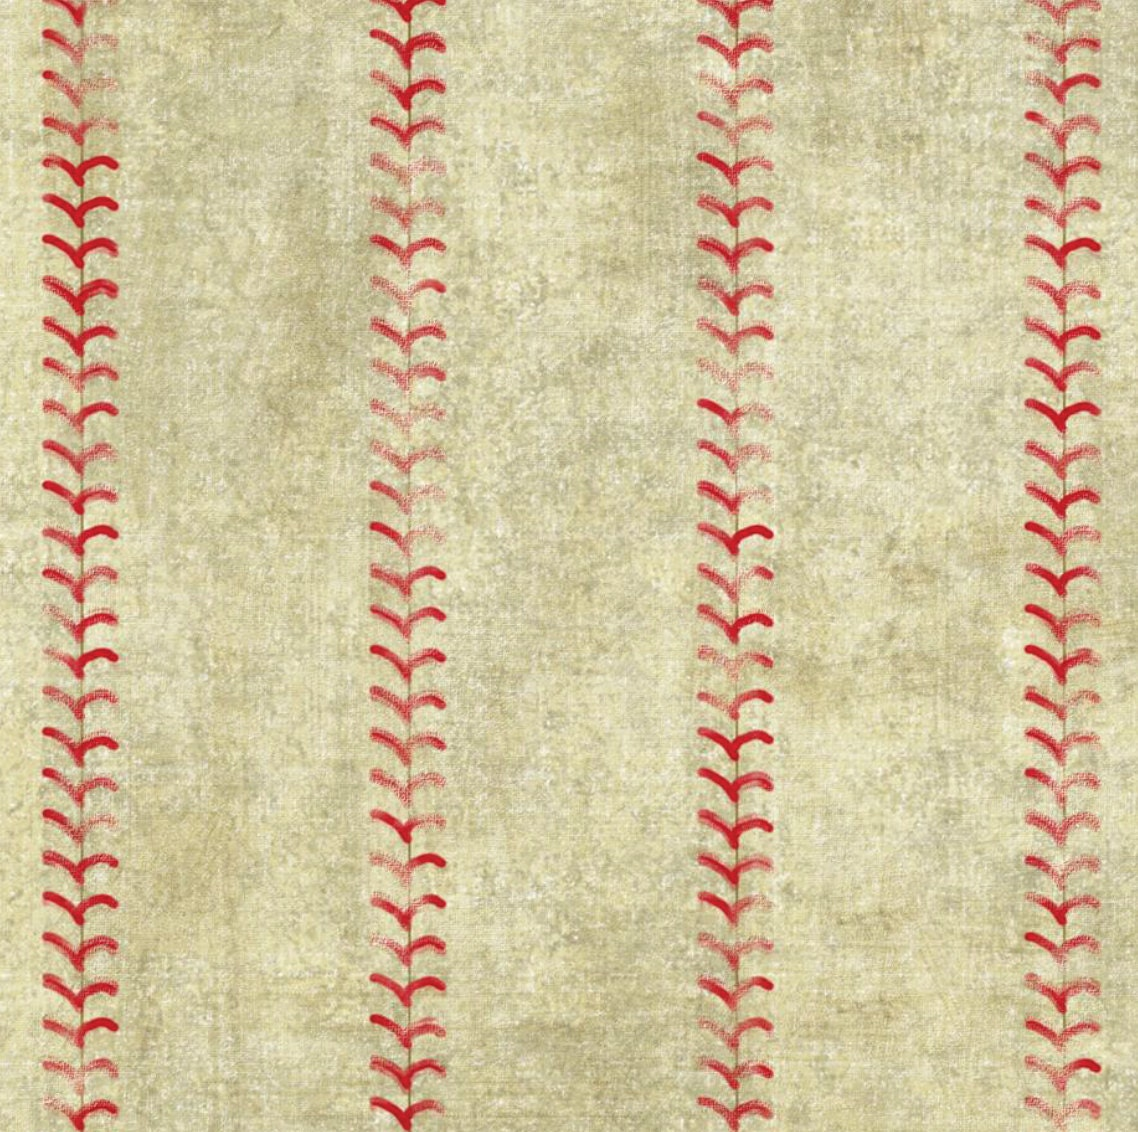 Baseball Print Adhesive Vinyl Baseball Print Heat